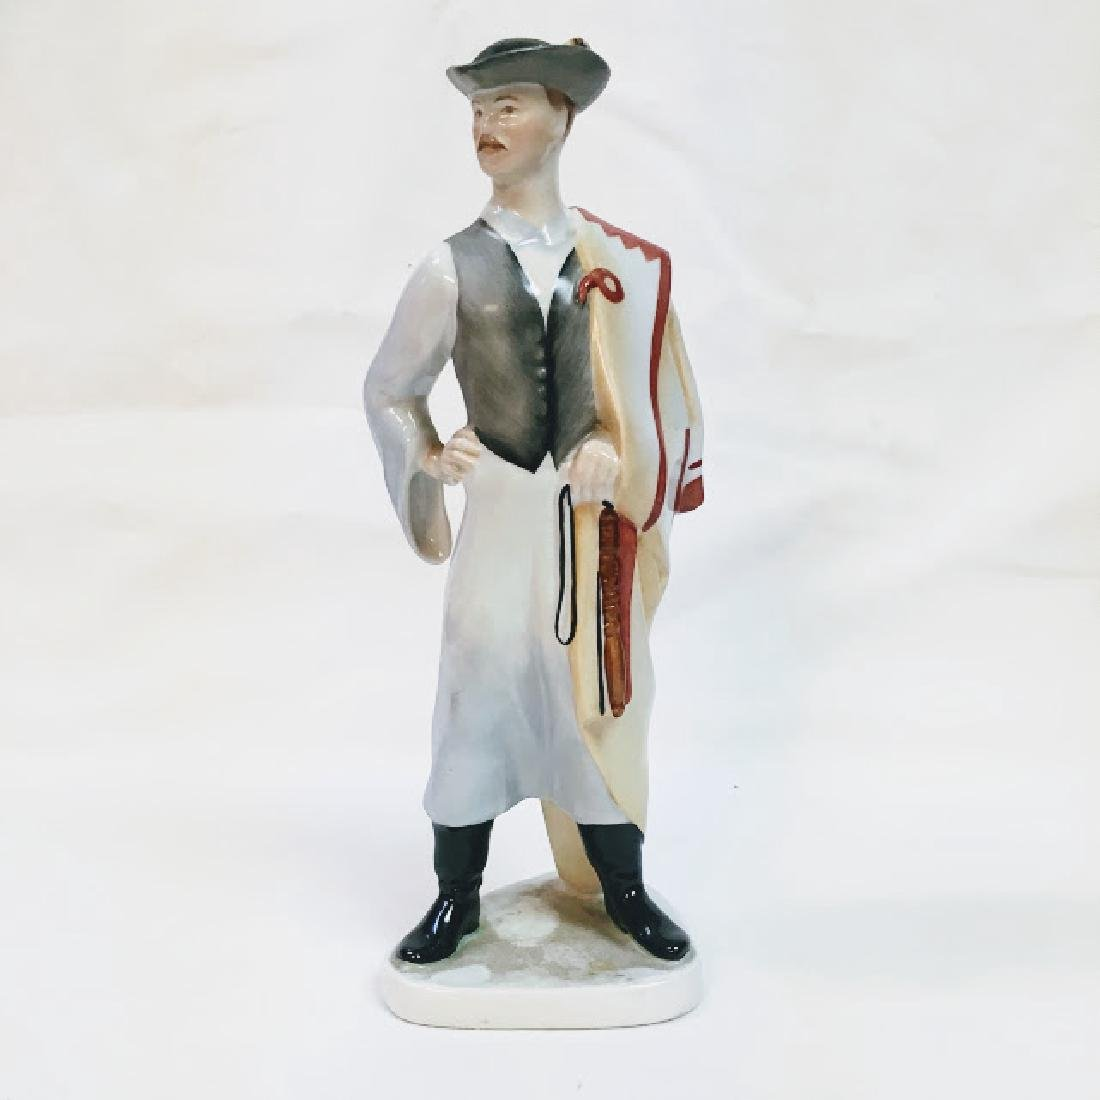 Kezifestes Budapest man in traditional costume figurine